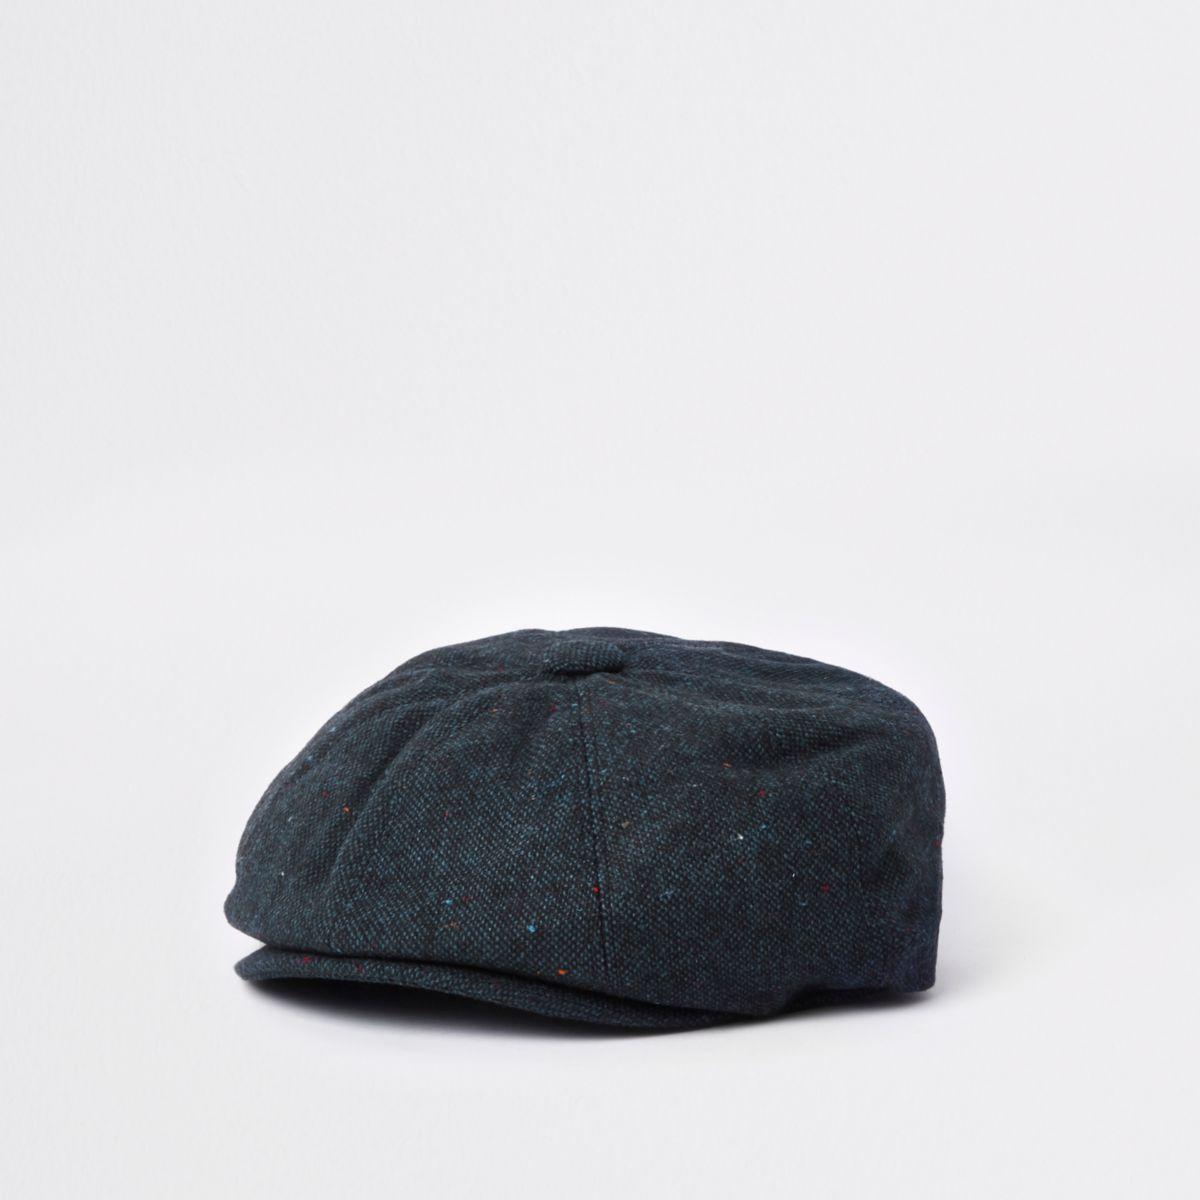 Navy baker boy hat